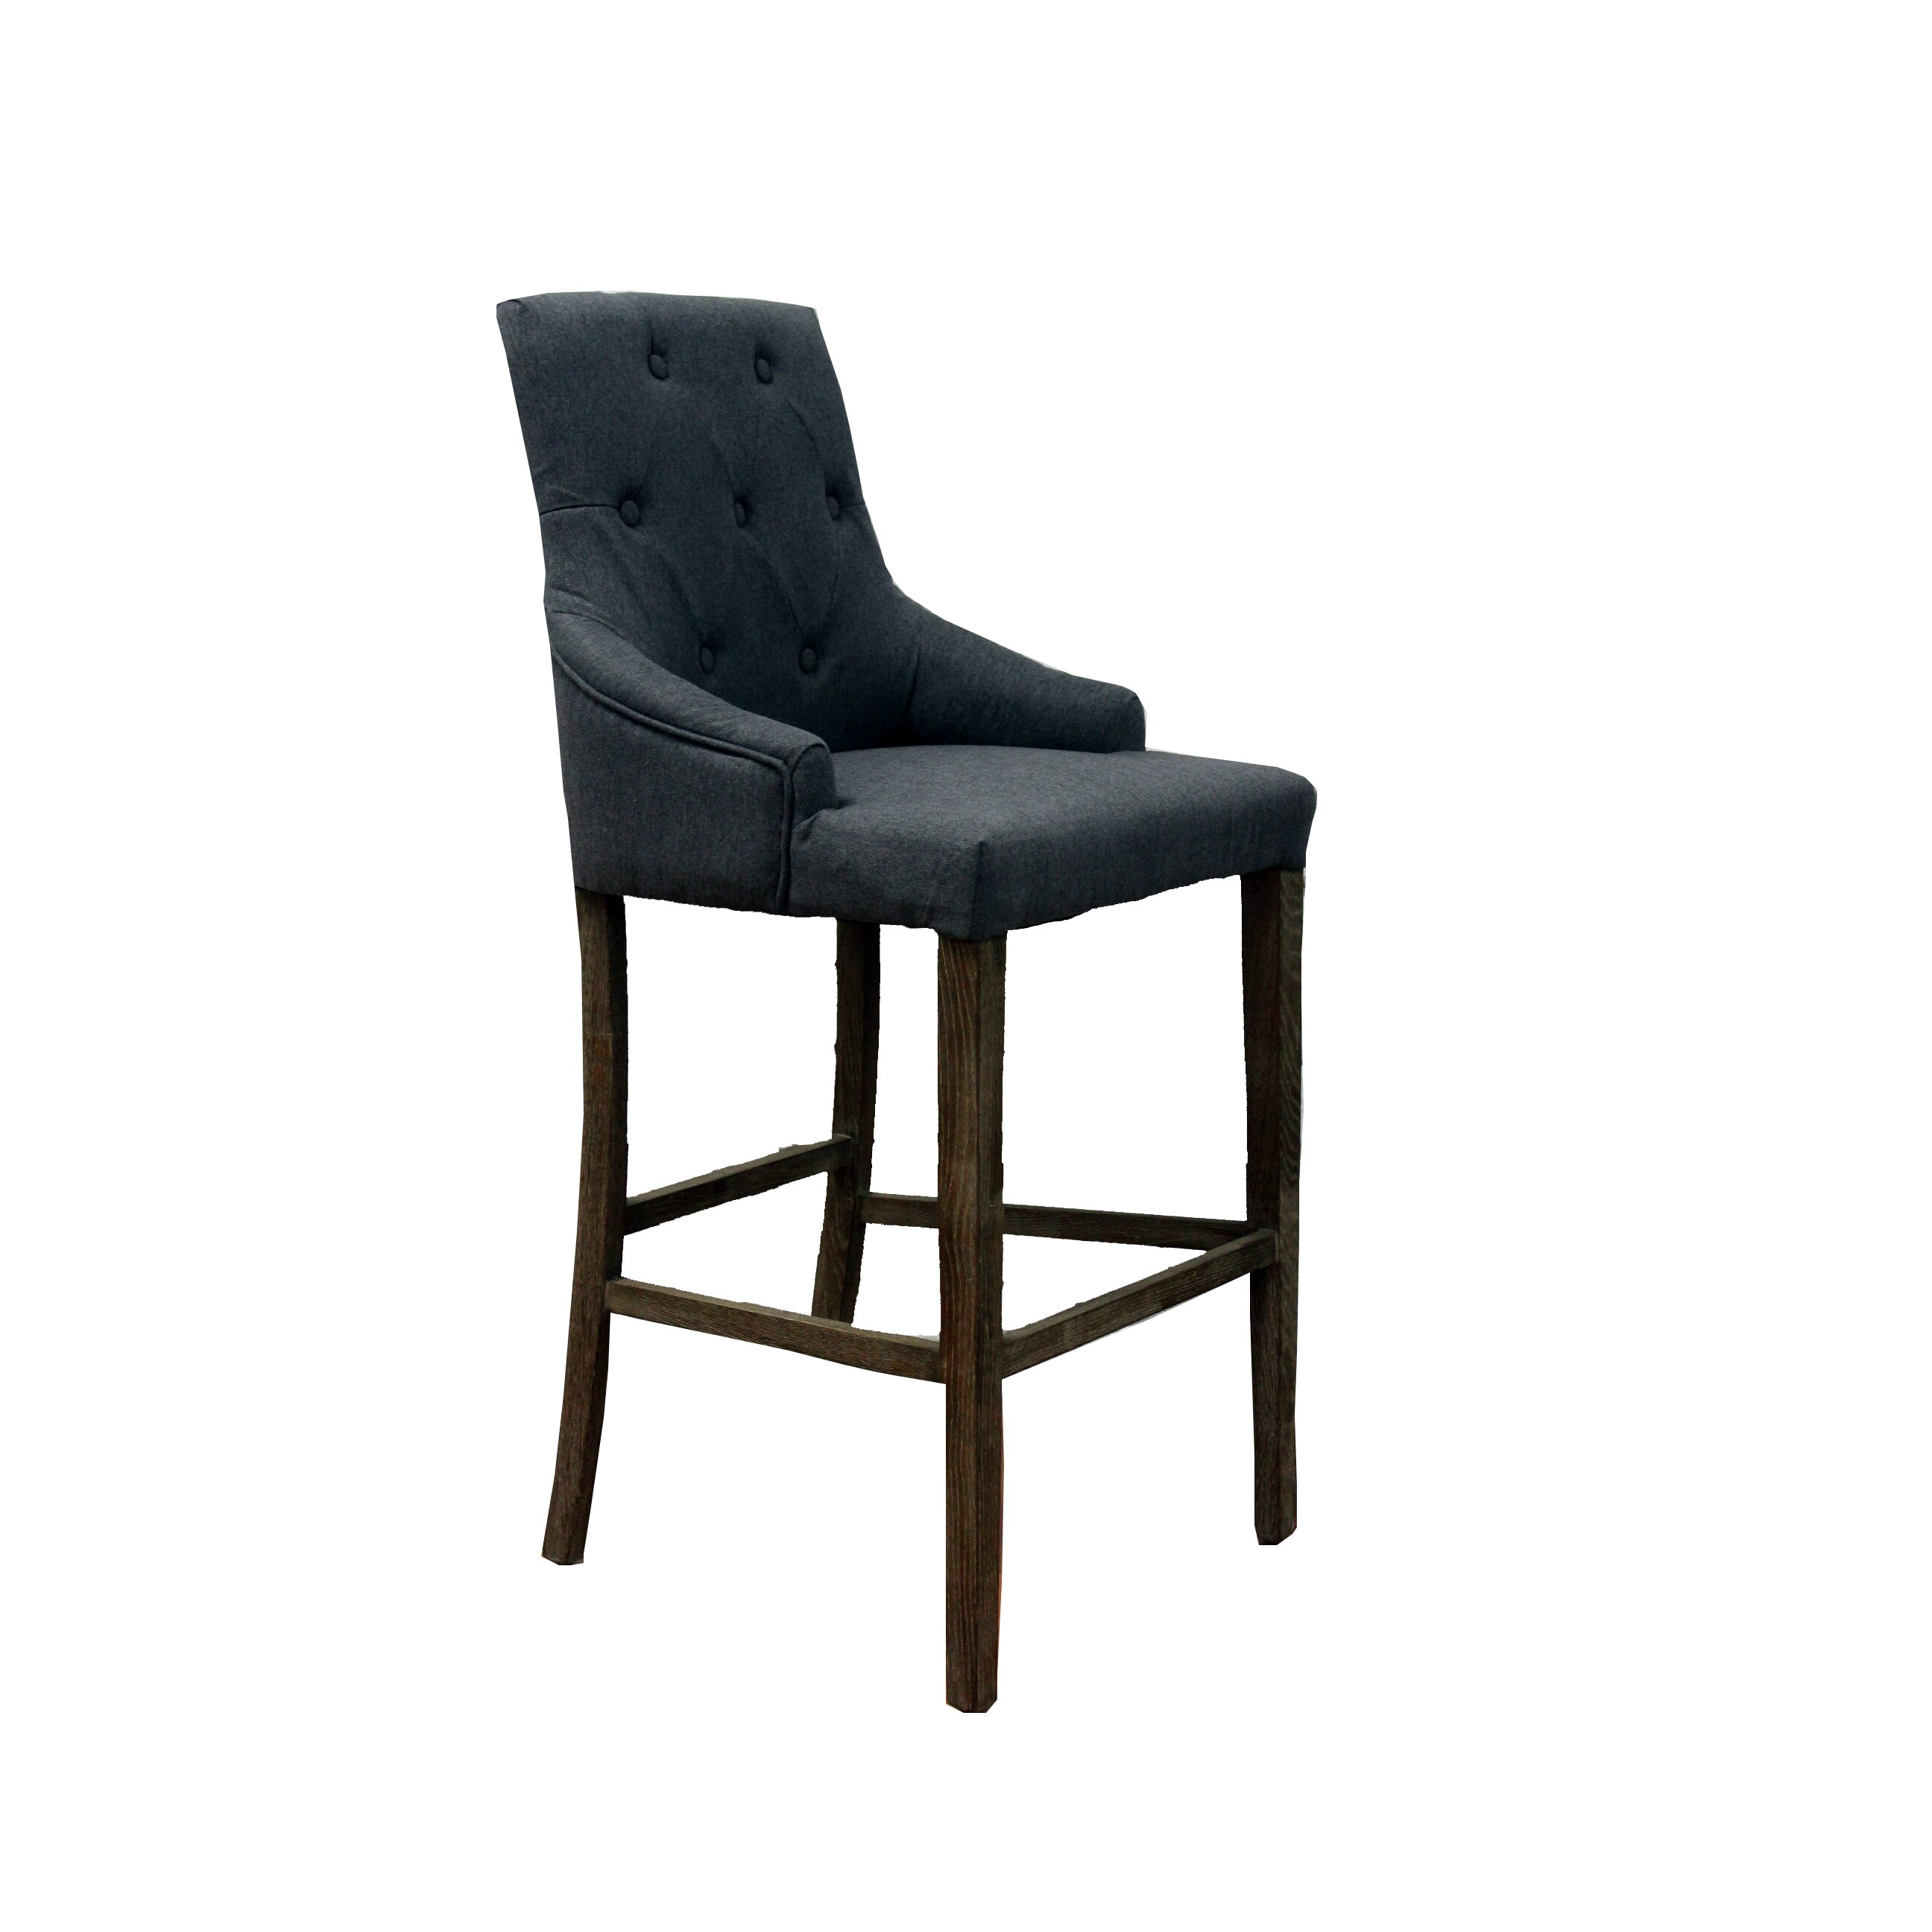 MOTI Furniture 26quot Bar Stool Wayfair : 88011035 88011035 from www.wayfair.com size 2592 x 2592 jpeg 361kB